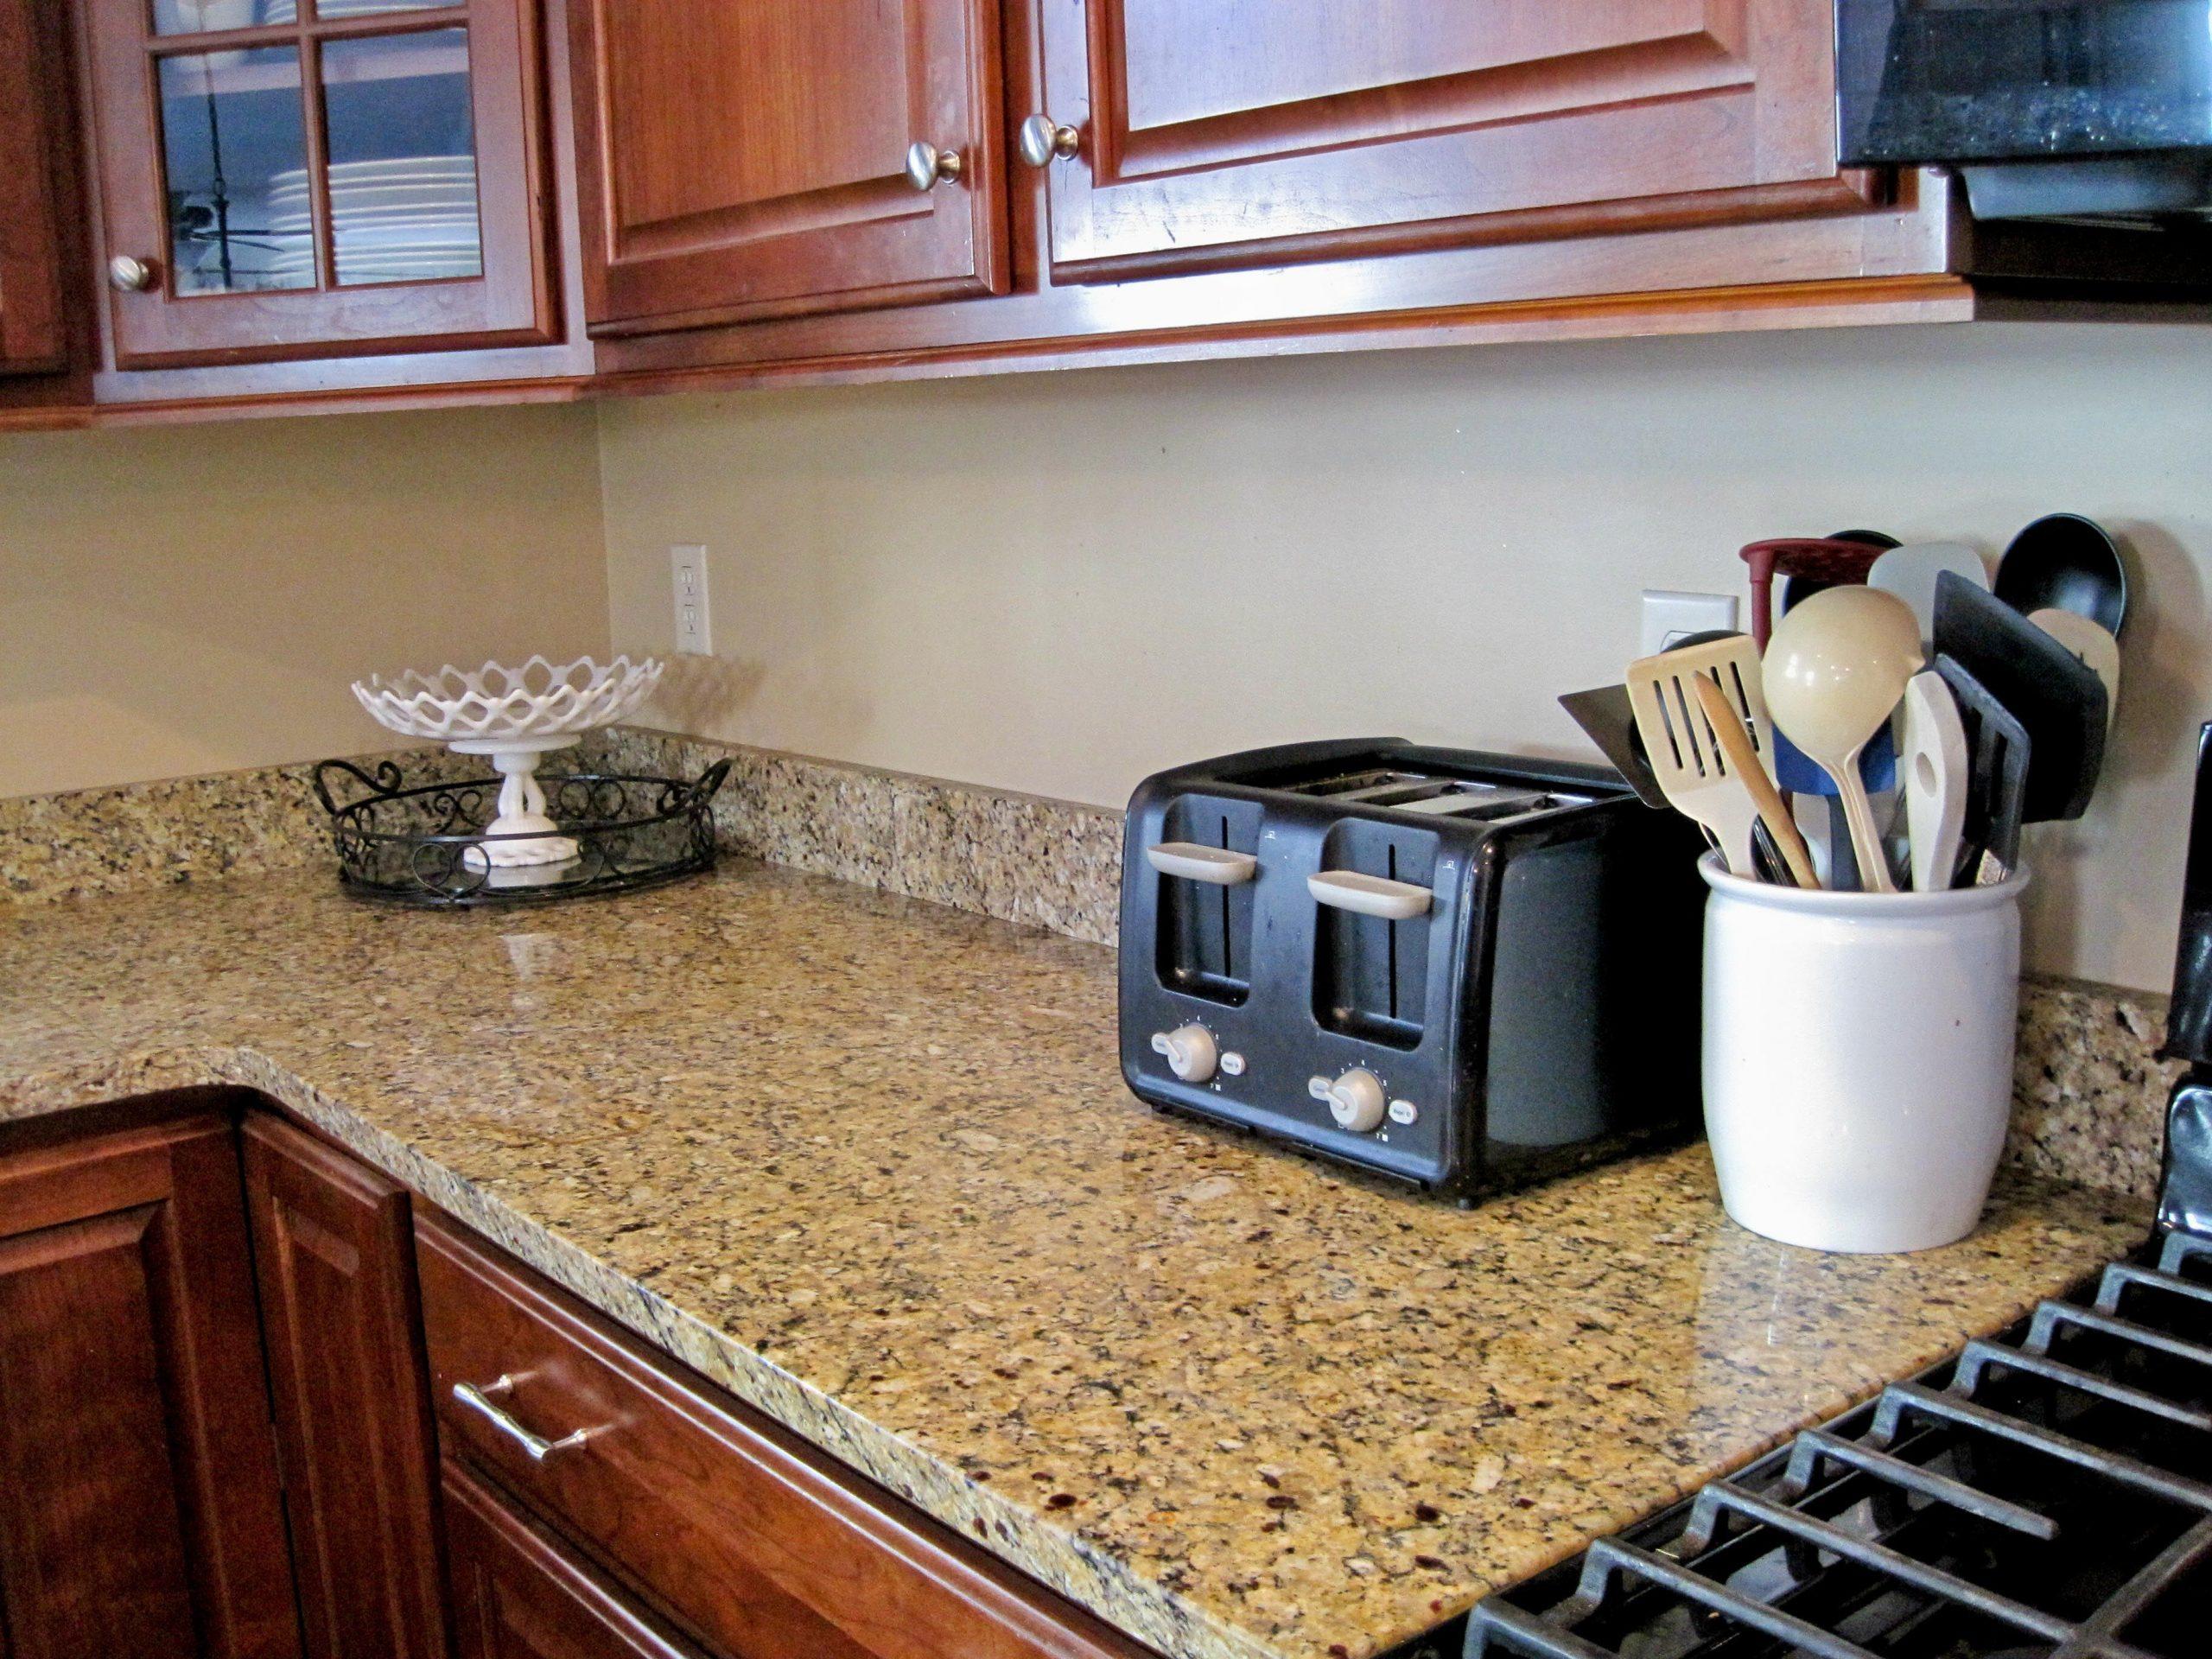 countertop short backsplash  Short backsplash in same material as countertop!   Kitchen ..